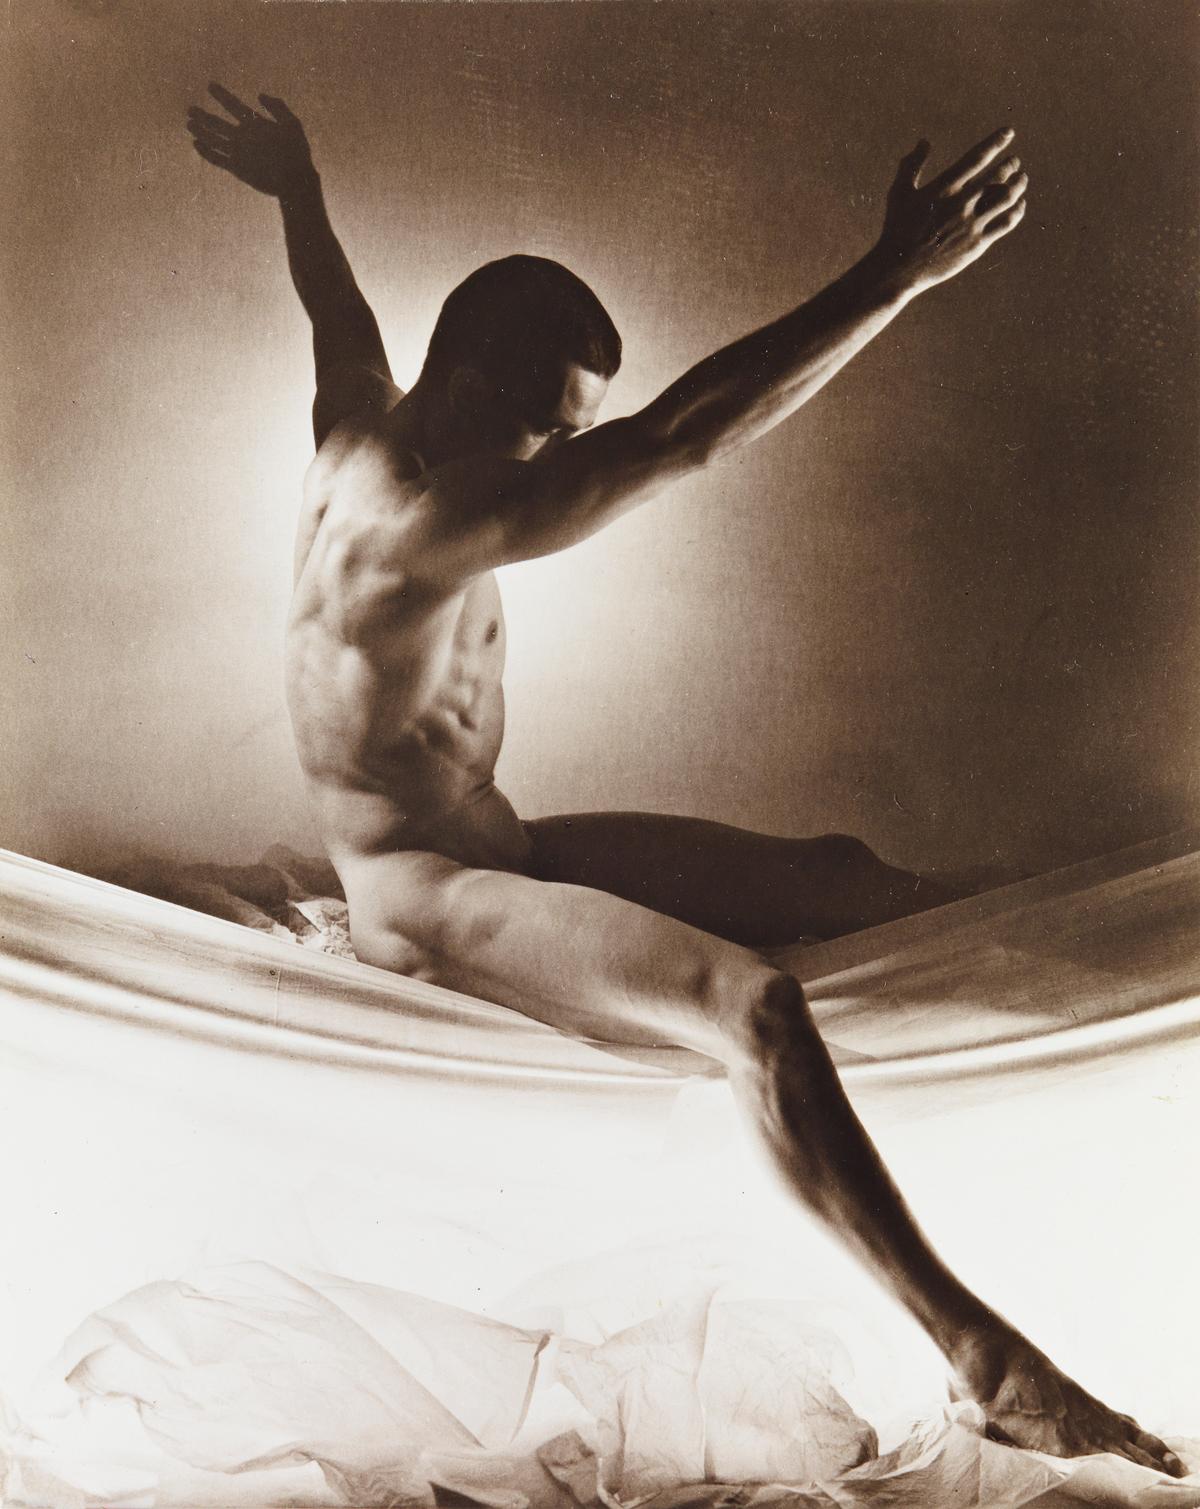 GEORGE PLATT LYNES (1907-1955) Francisco Moncion.